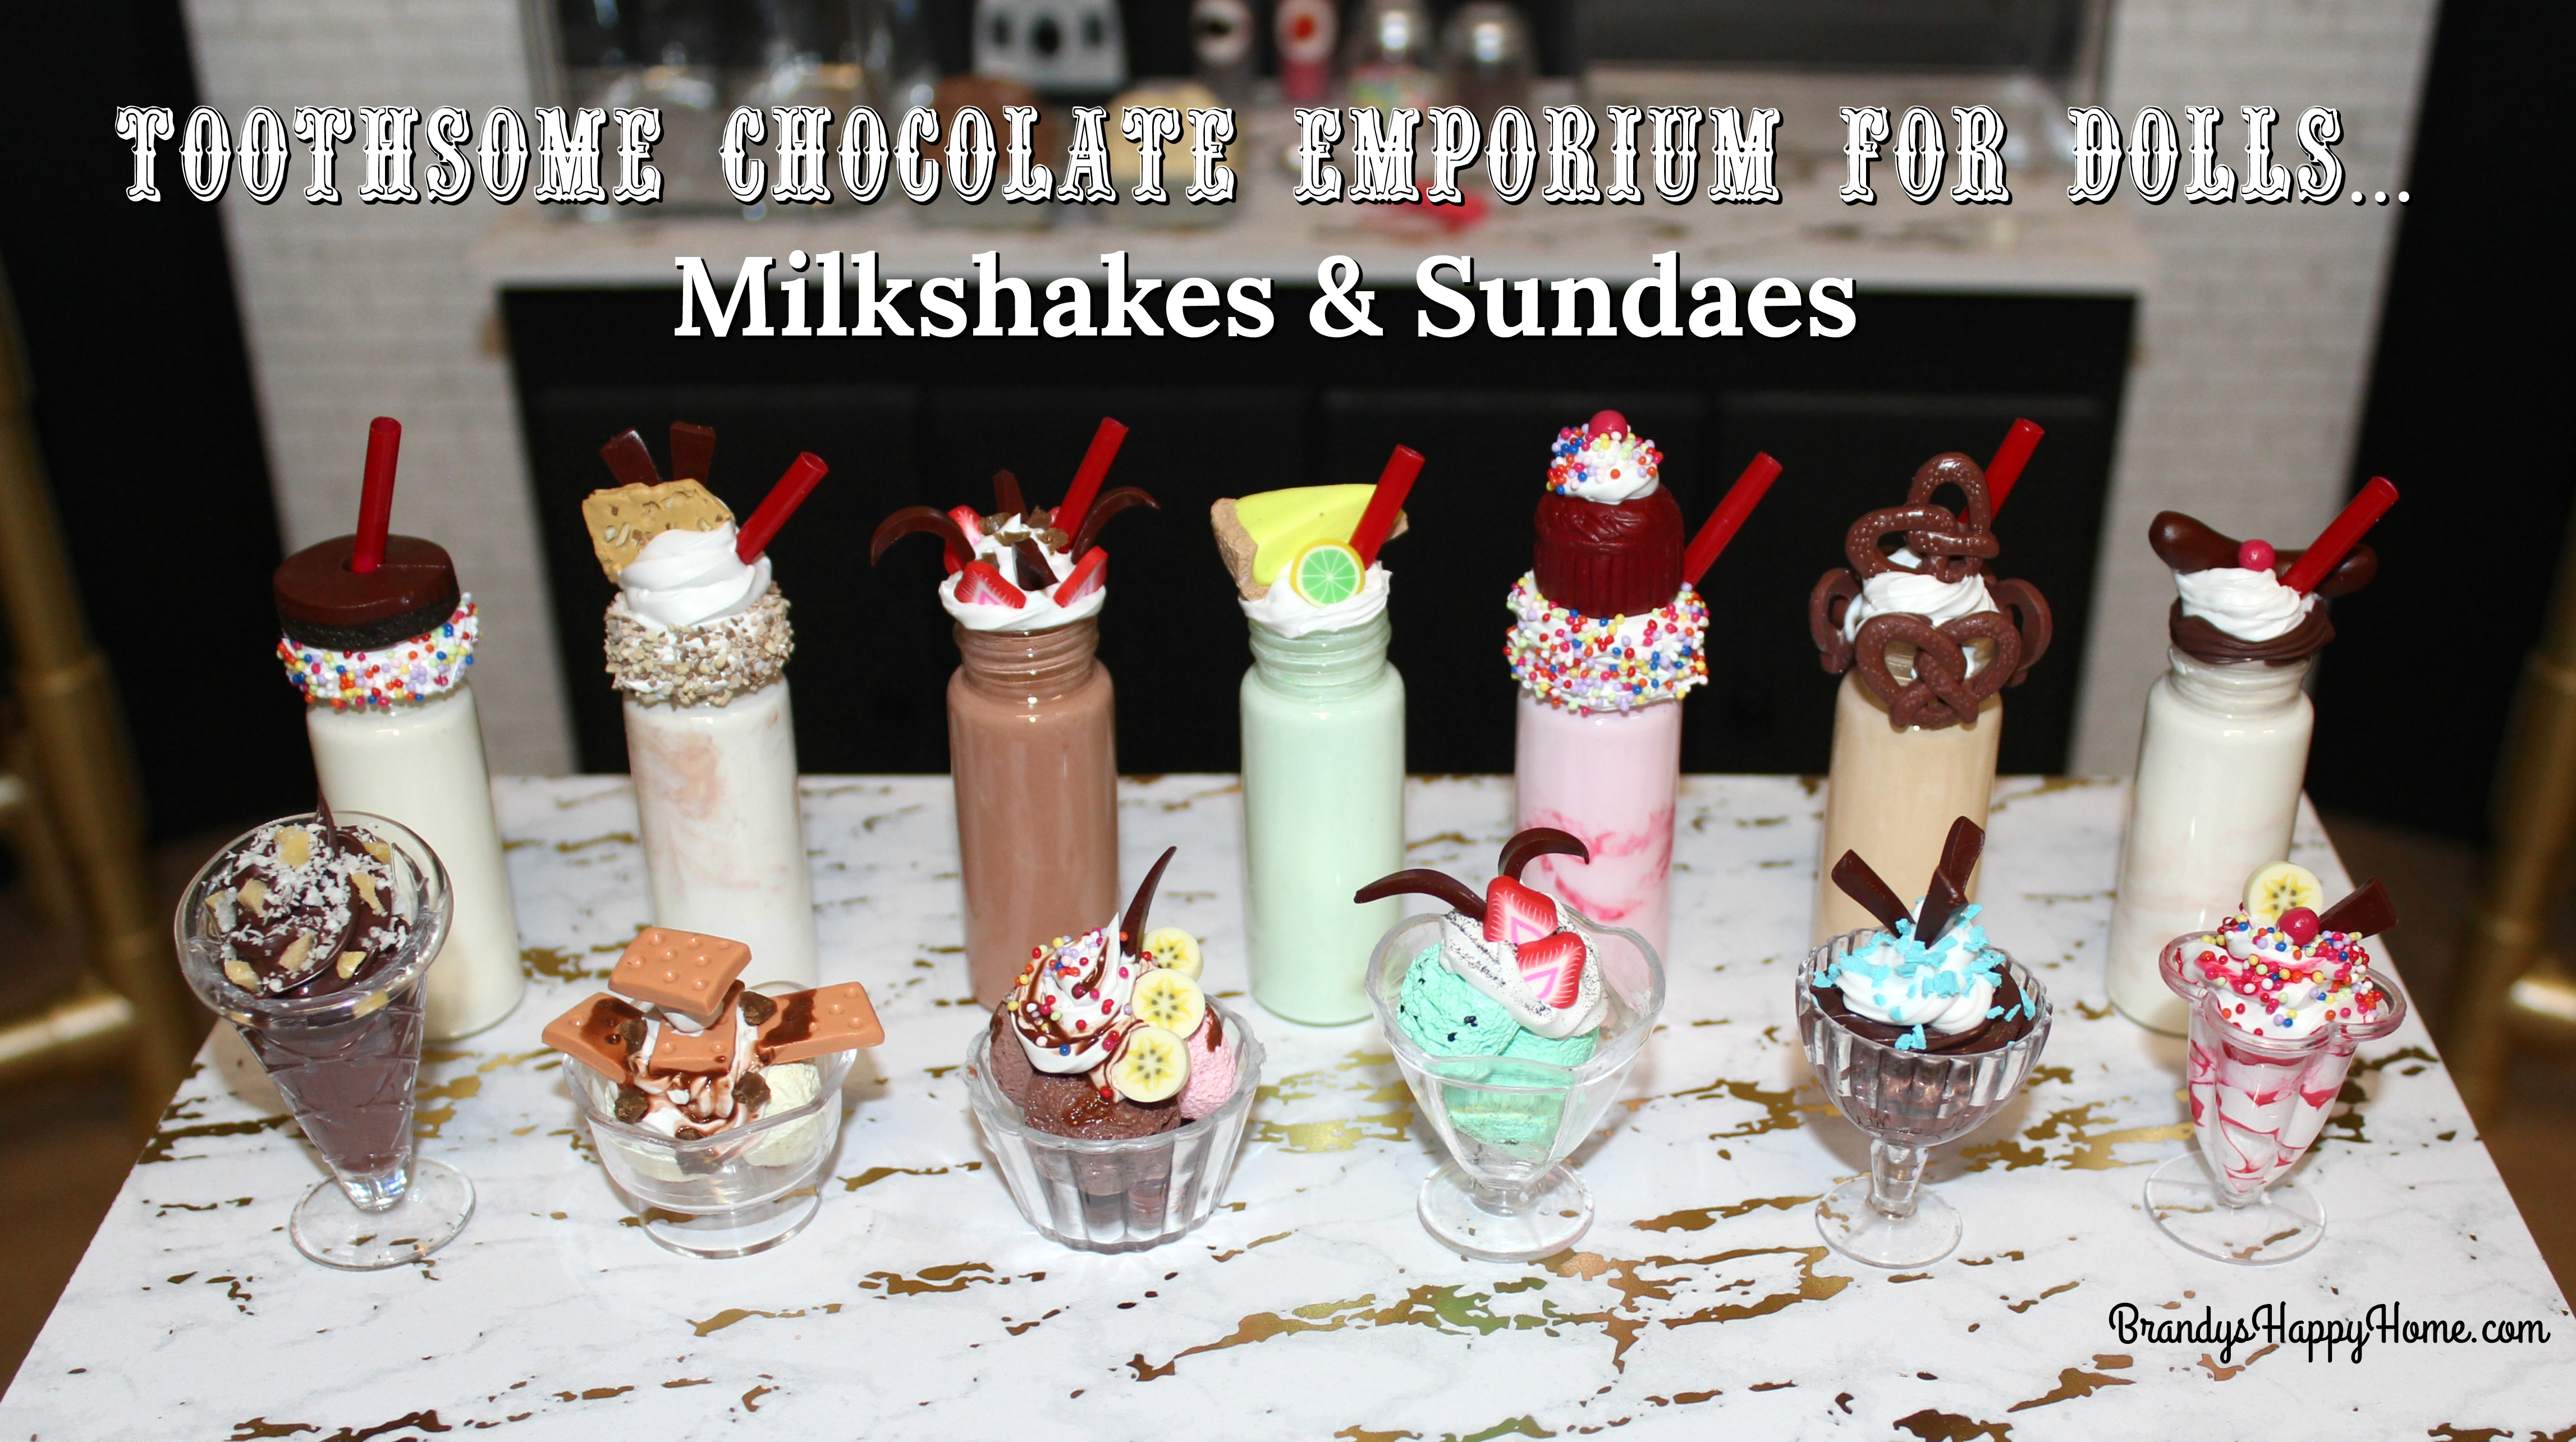 Toothsome Chocolate Emporium For Dollsdiy Milkshakes